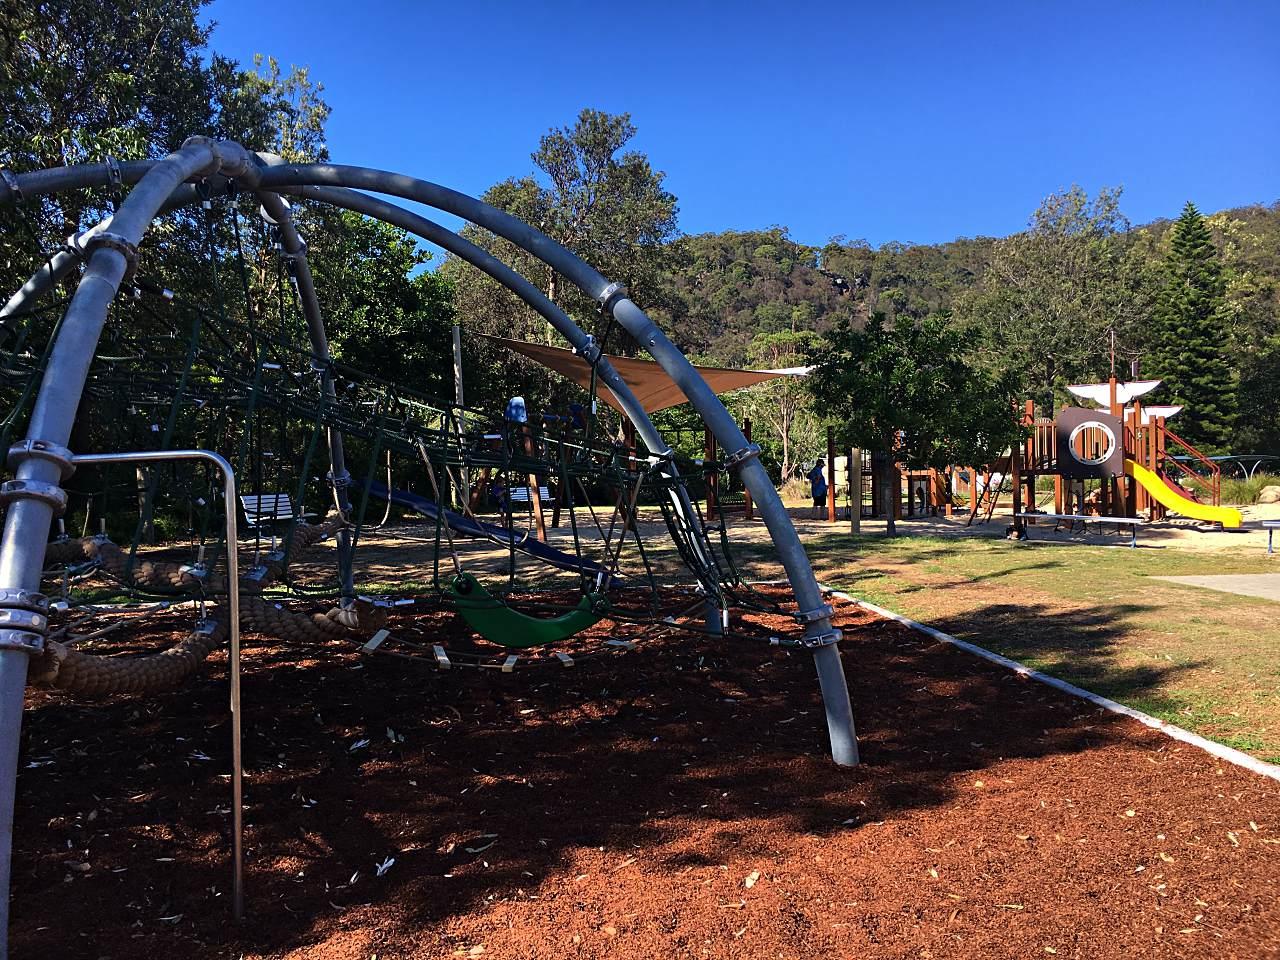 Patonga Camping Ground Playground